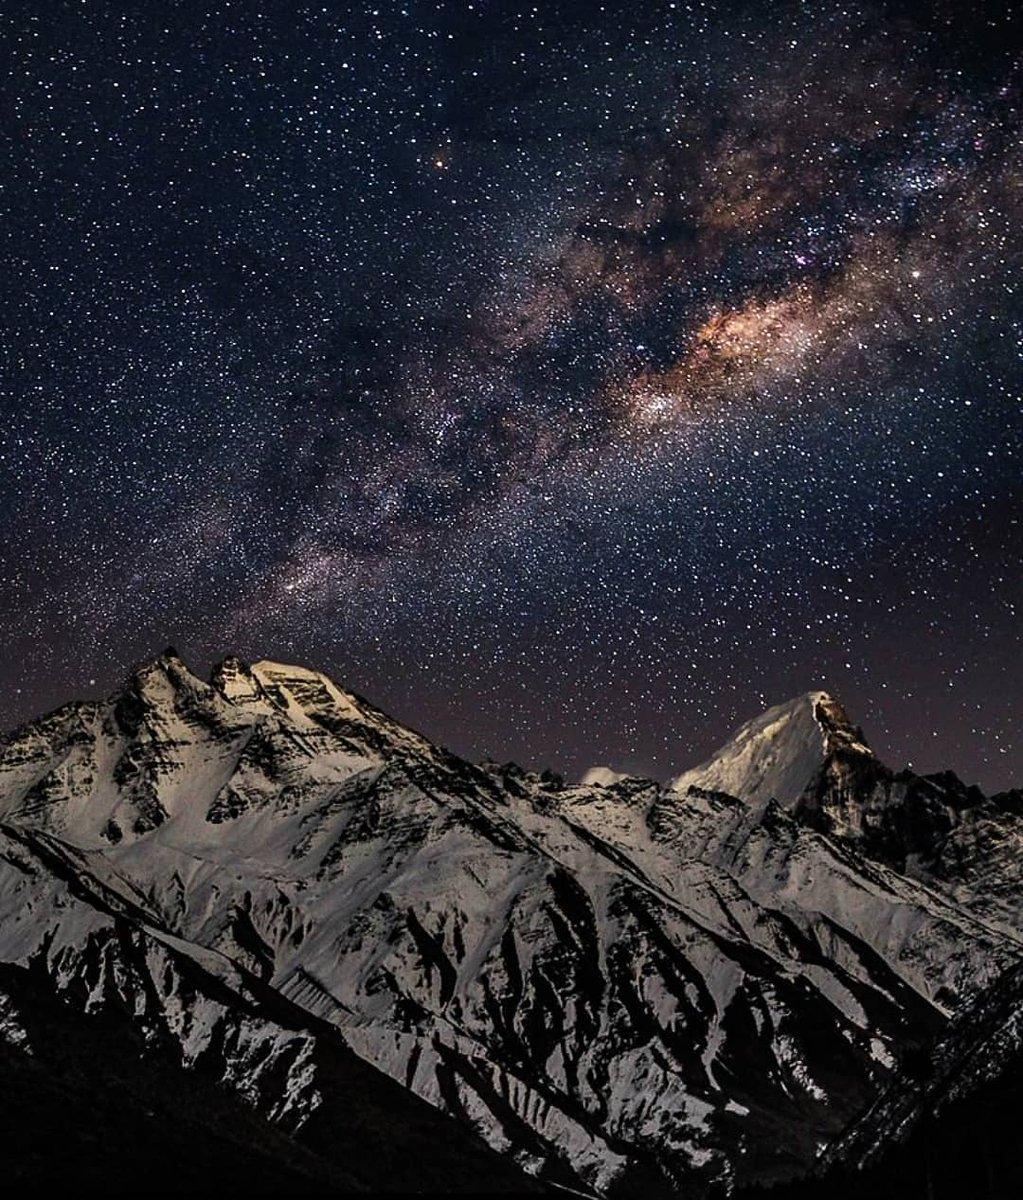 Nopți albe-n Himalaya. Pohta ce-am pohtit. Ora 5:15/ 28.03.2021  #SonyAlpha https://t.co/nW0wDJQvSr